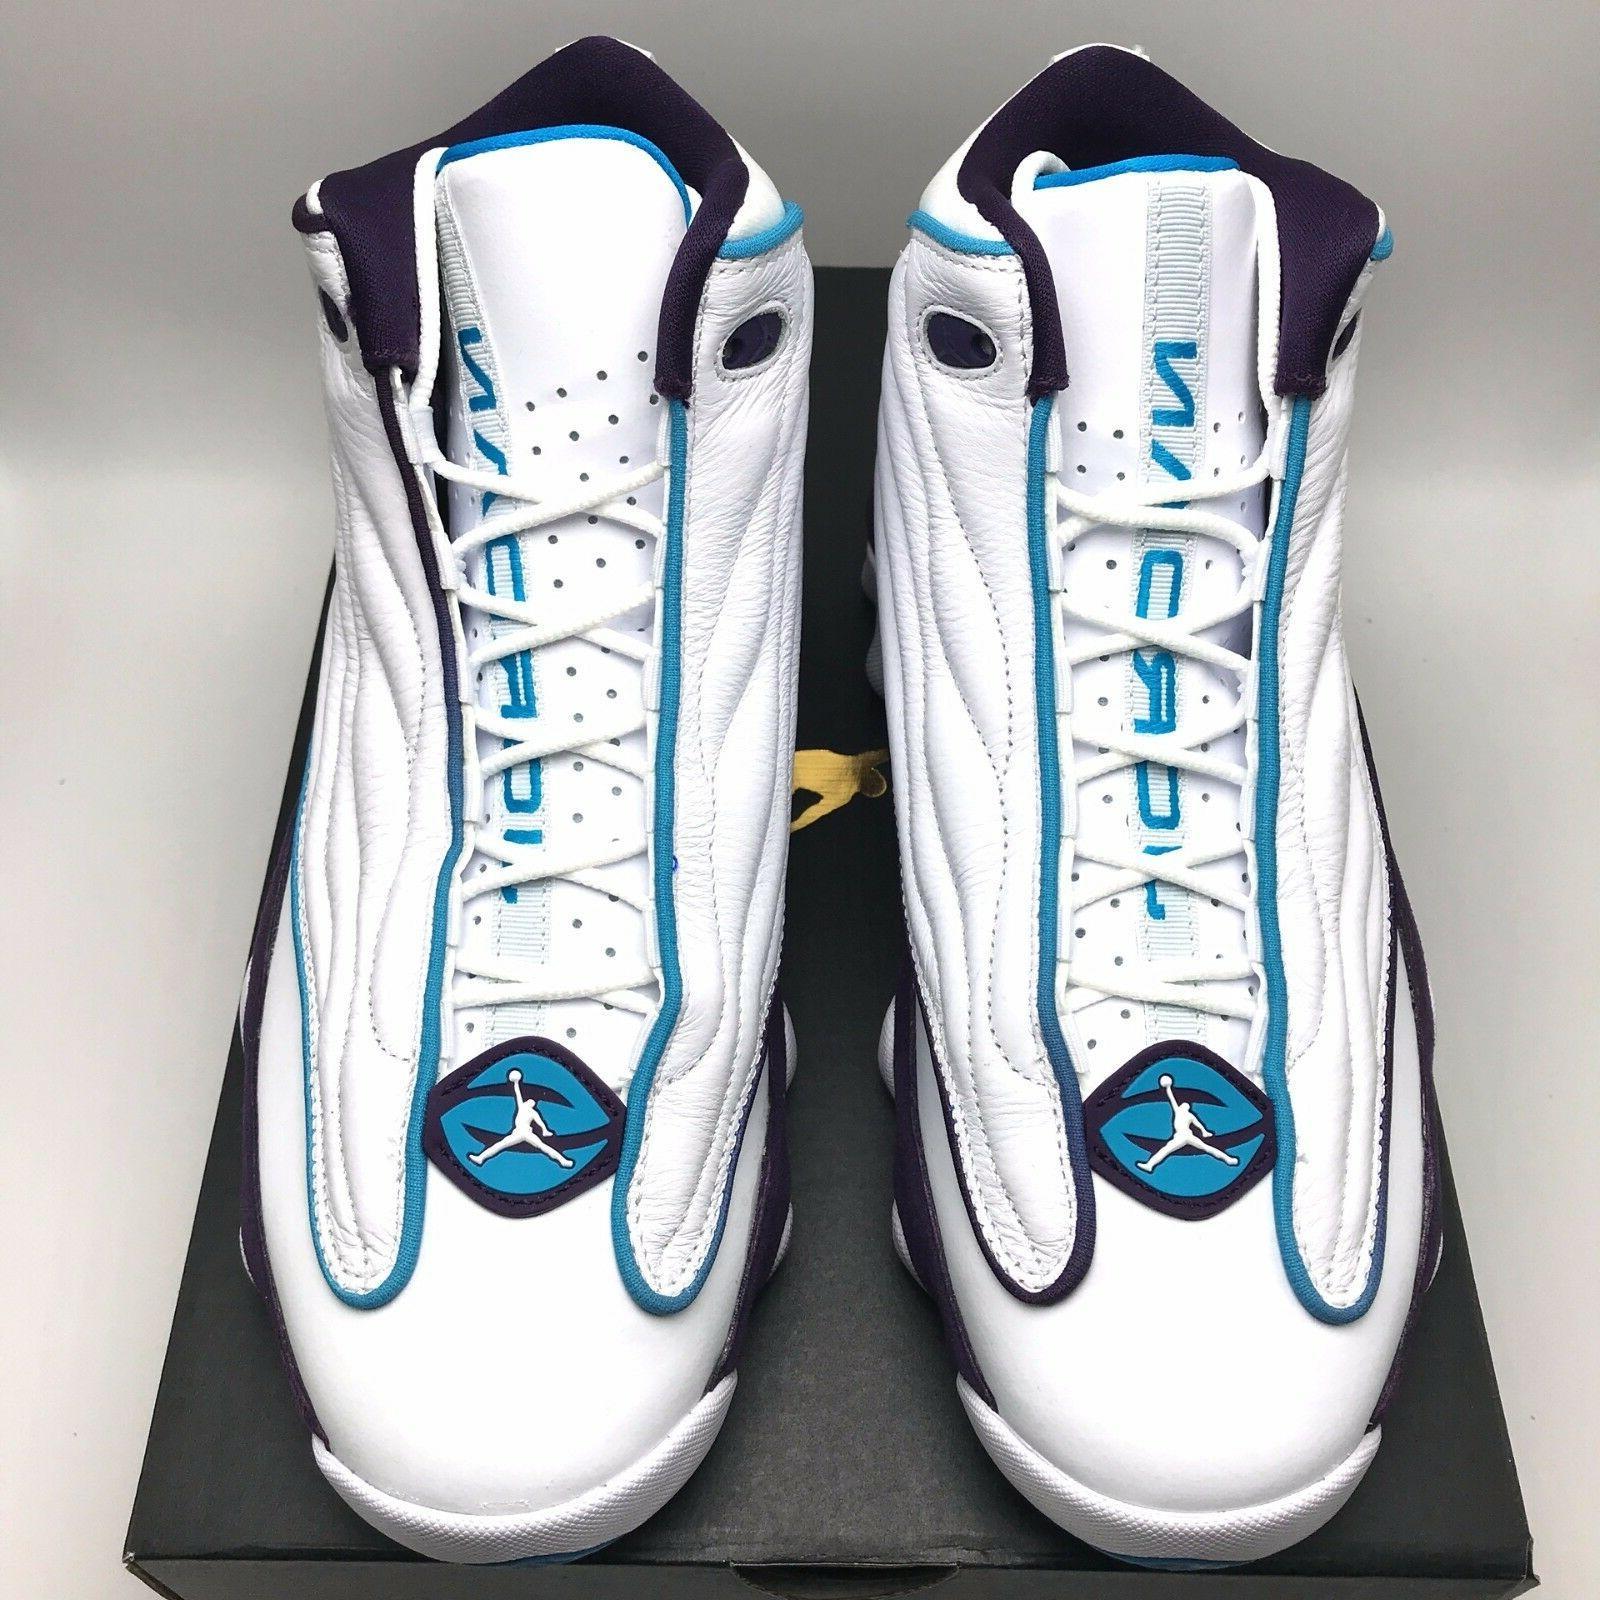 Nike Pro Strong Men's Shoes White/Blue Purple